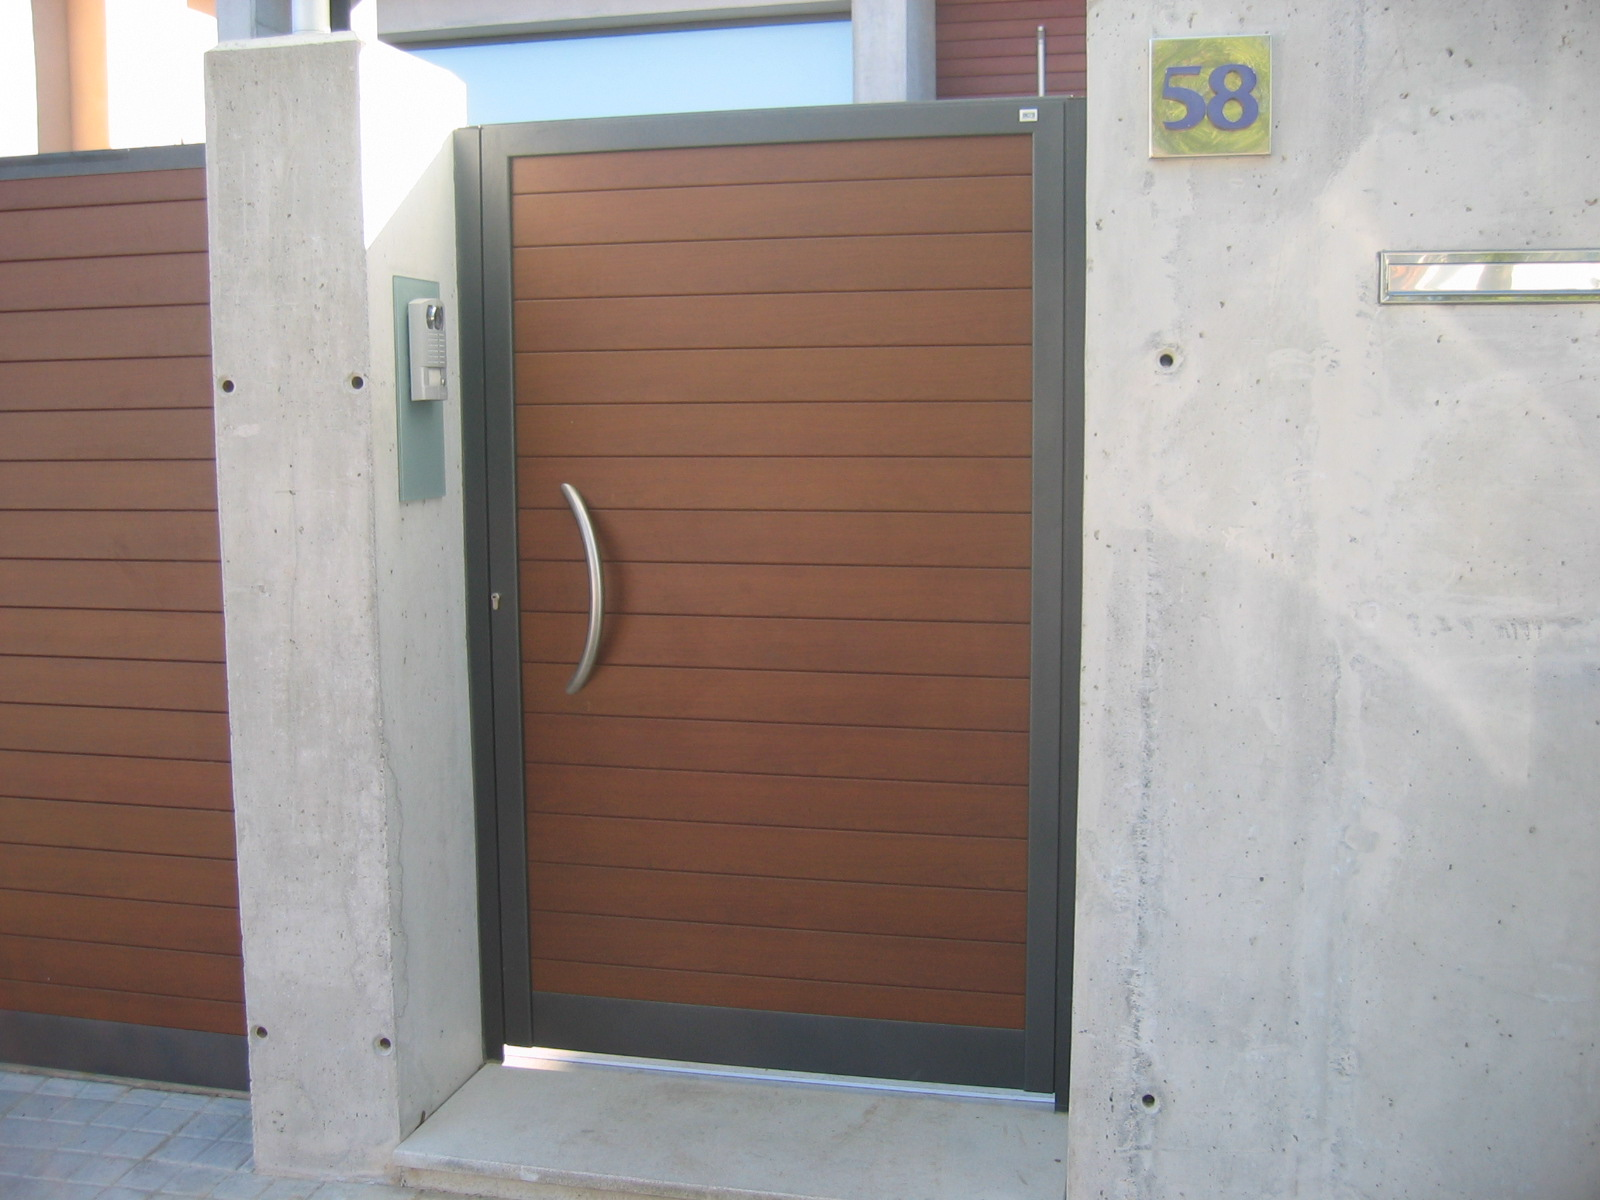 Puertas de jardin puerta jardin valdebebas puertas de - Puertas de hierro para jardin ...